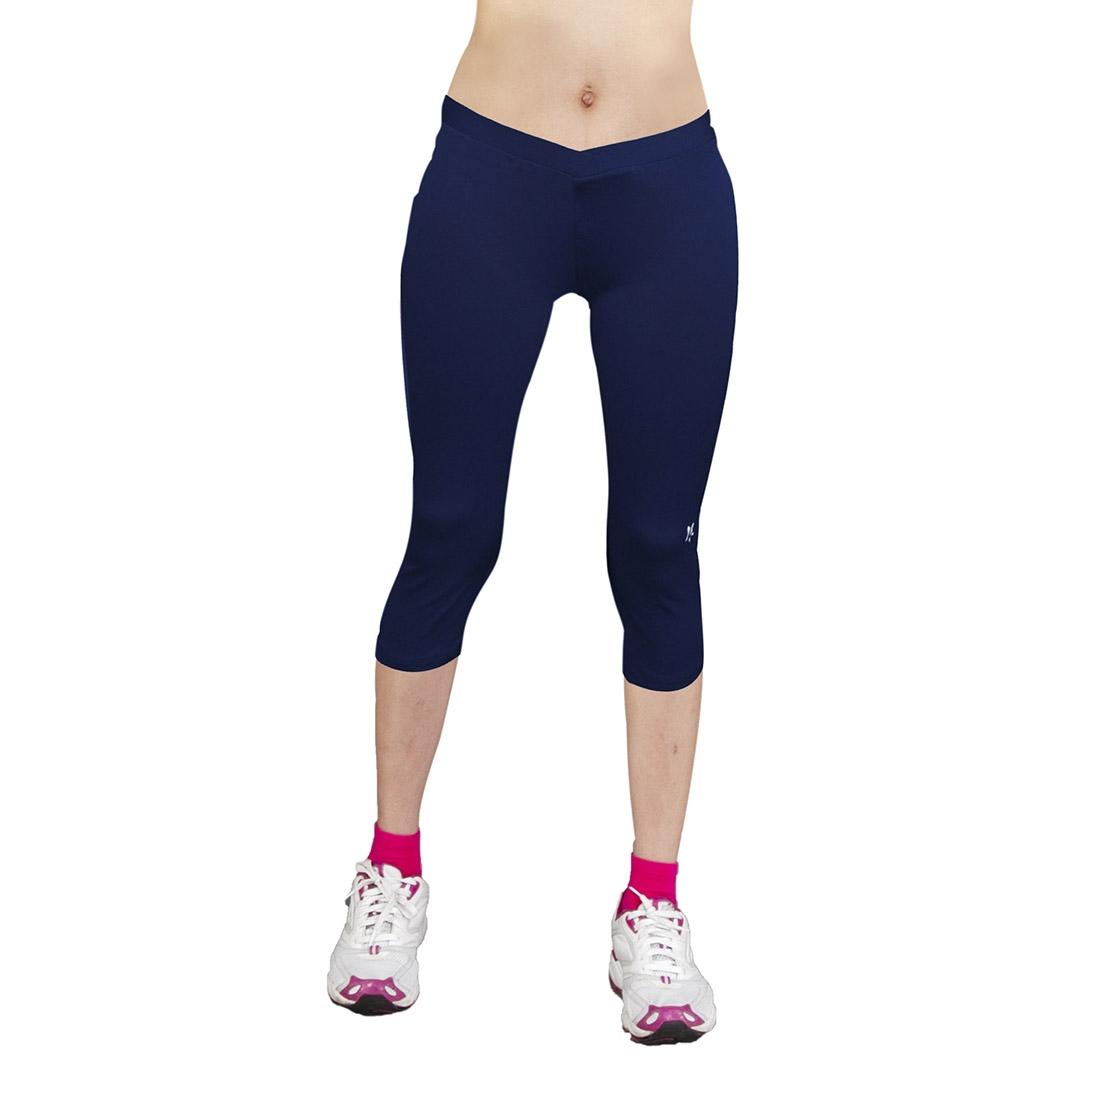 lasona women sportswear celana olahraga 34 wanita st3